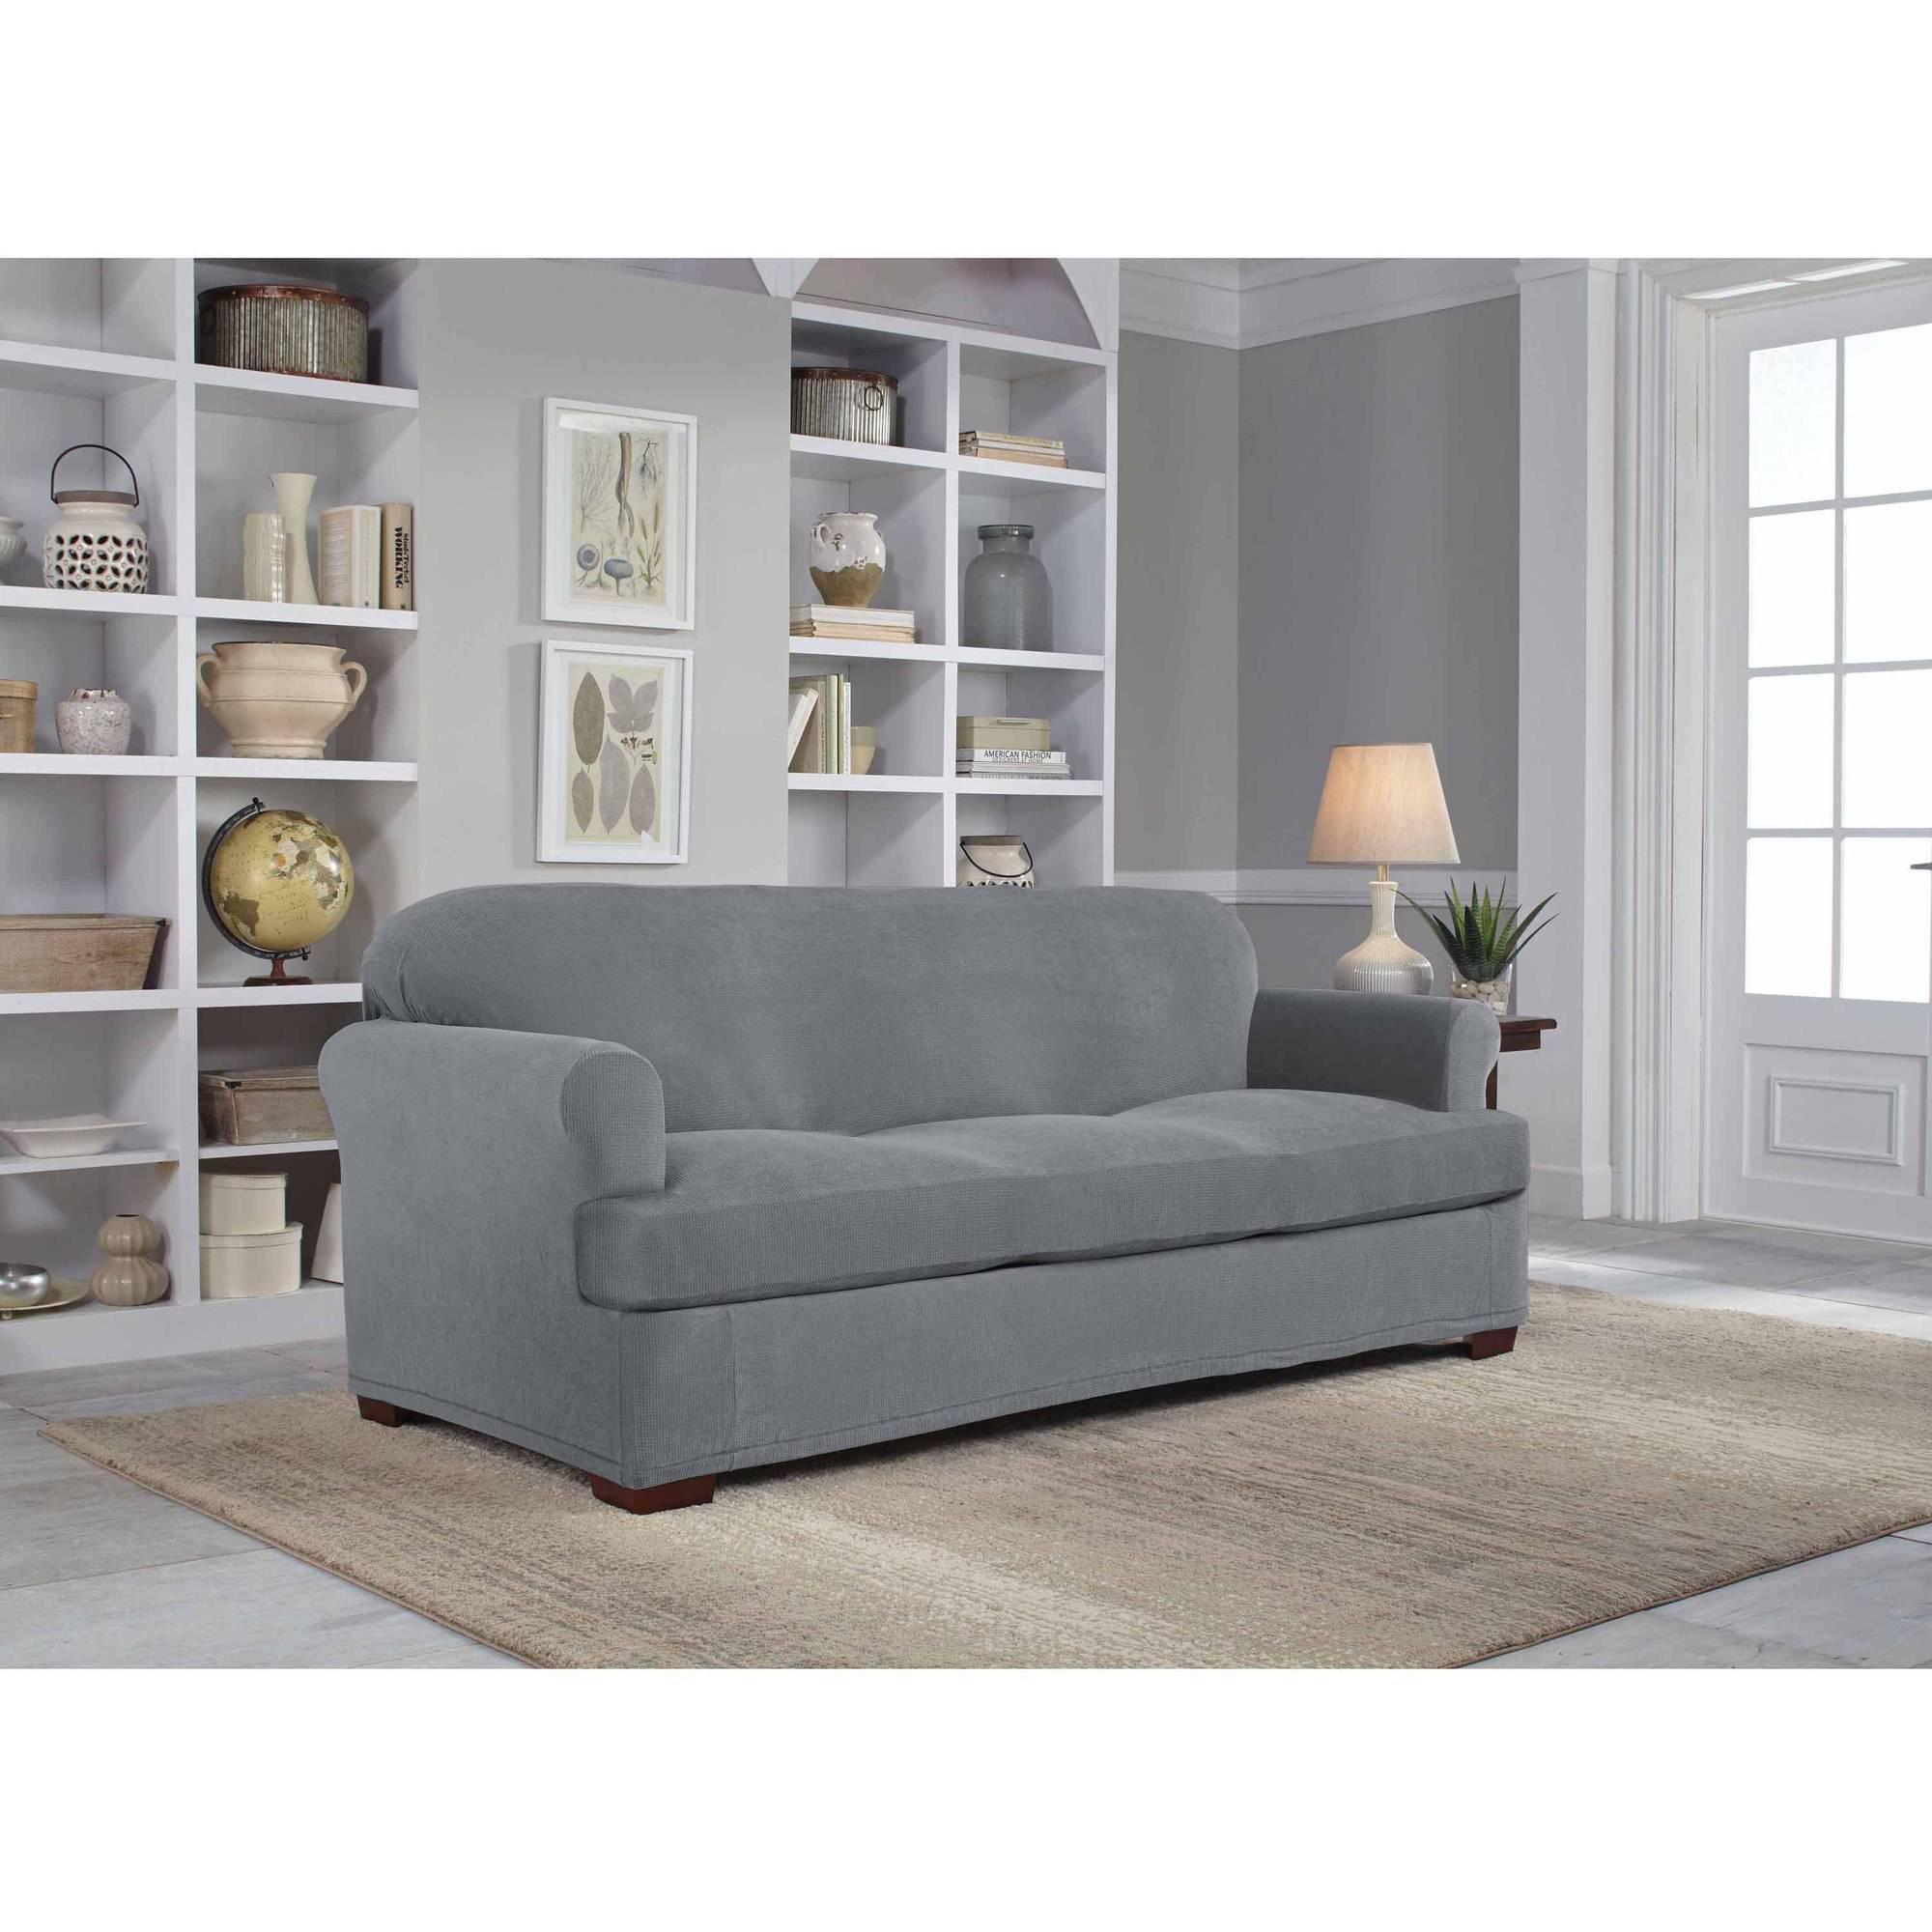 Serta Stretch Grid Slipcover, Sofa, 2 Piece T Cushion – Walmart Regarding 2 Piece Sofa Covers (View 27 of 27)